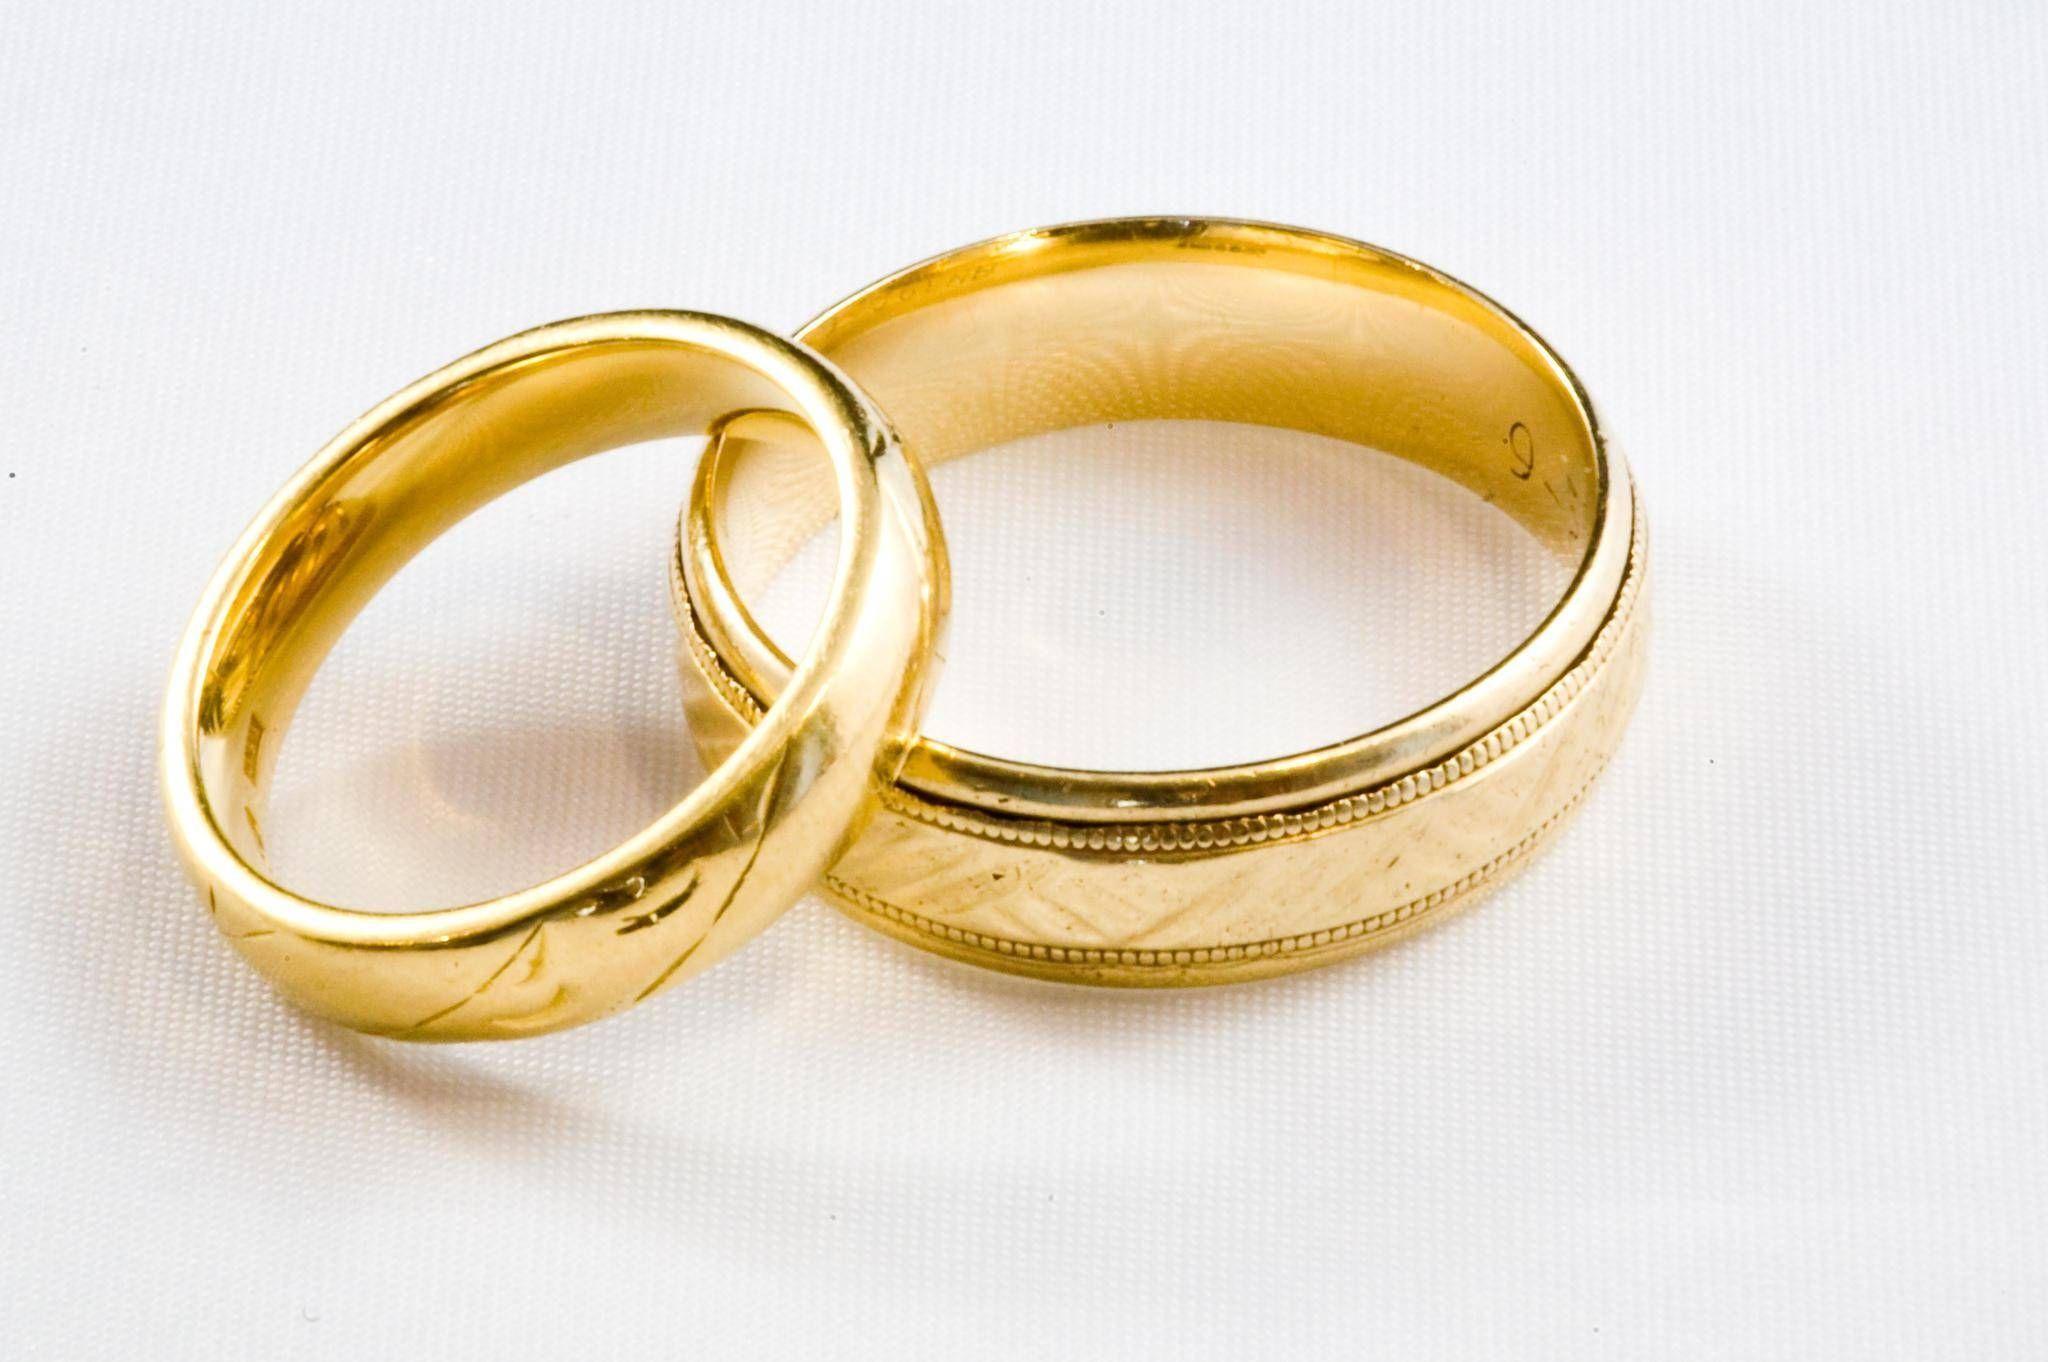 2018 Beliebten Engagement Gold Ringe Fur Paare Trauringe